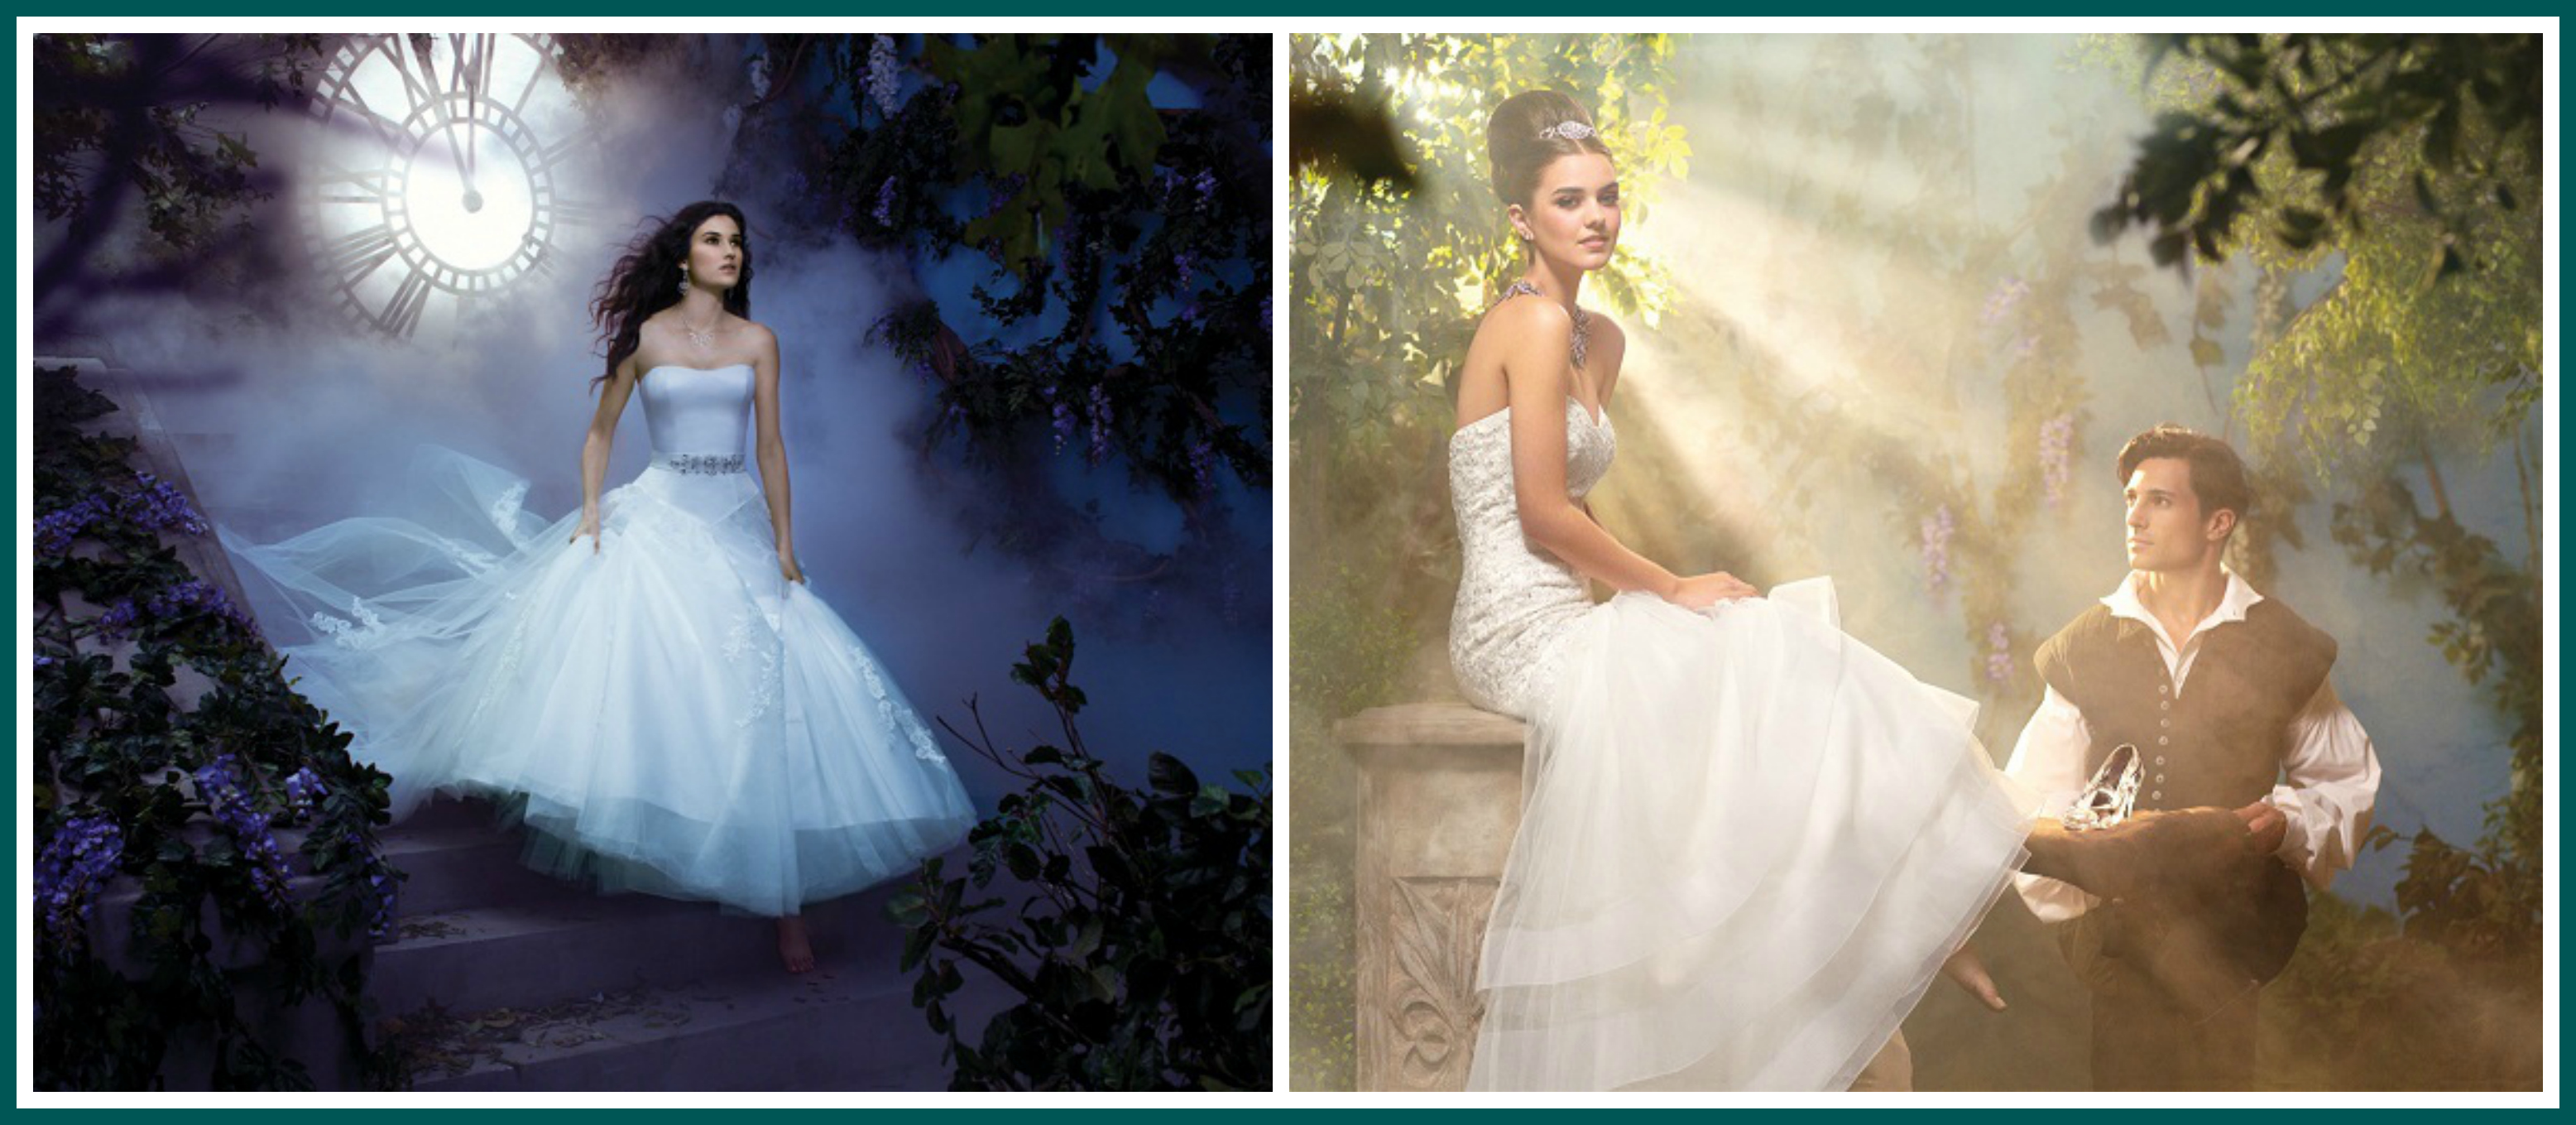 Some Dresses Are Worth Melting For: Disney Princess Wedding ...